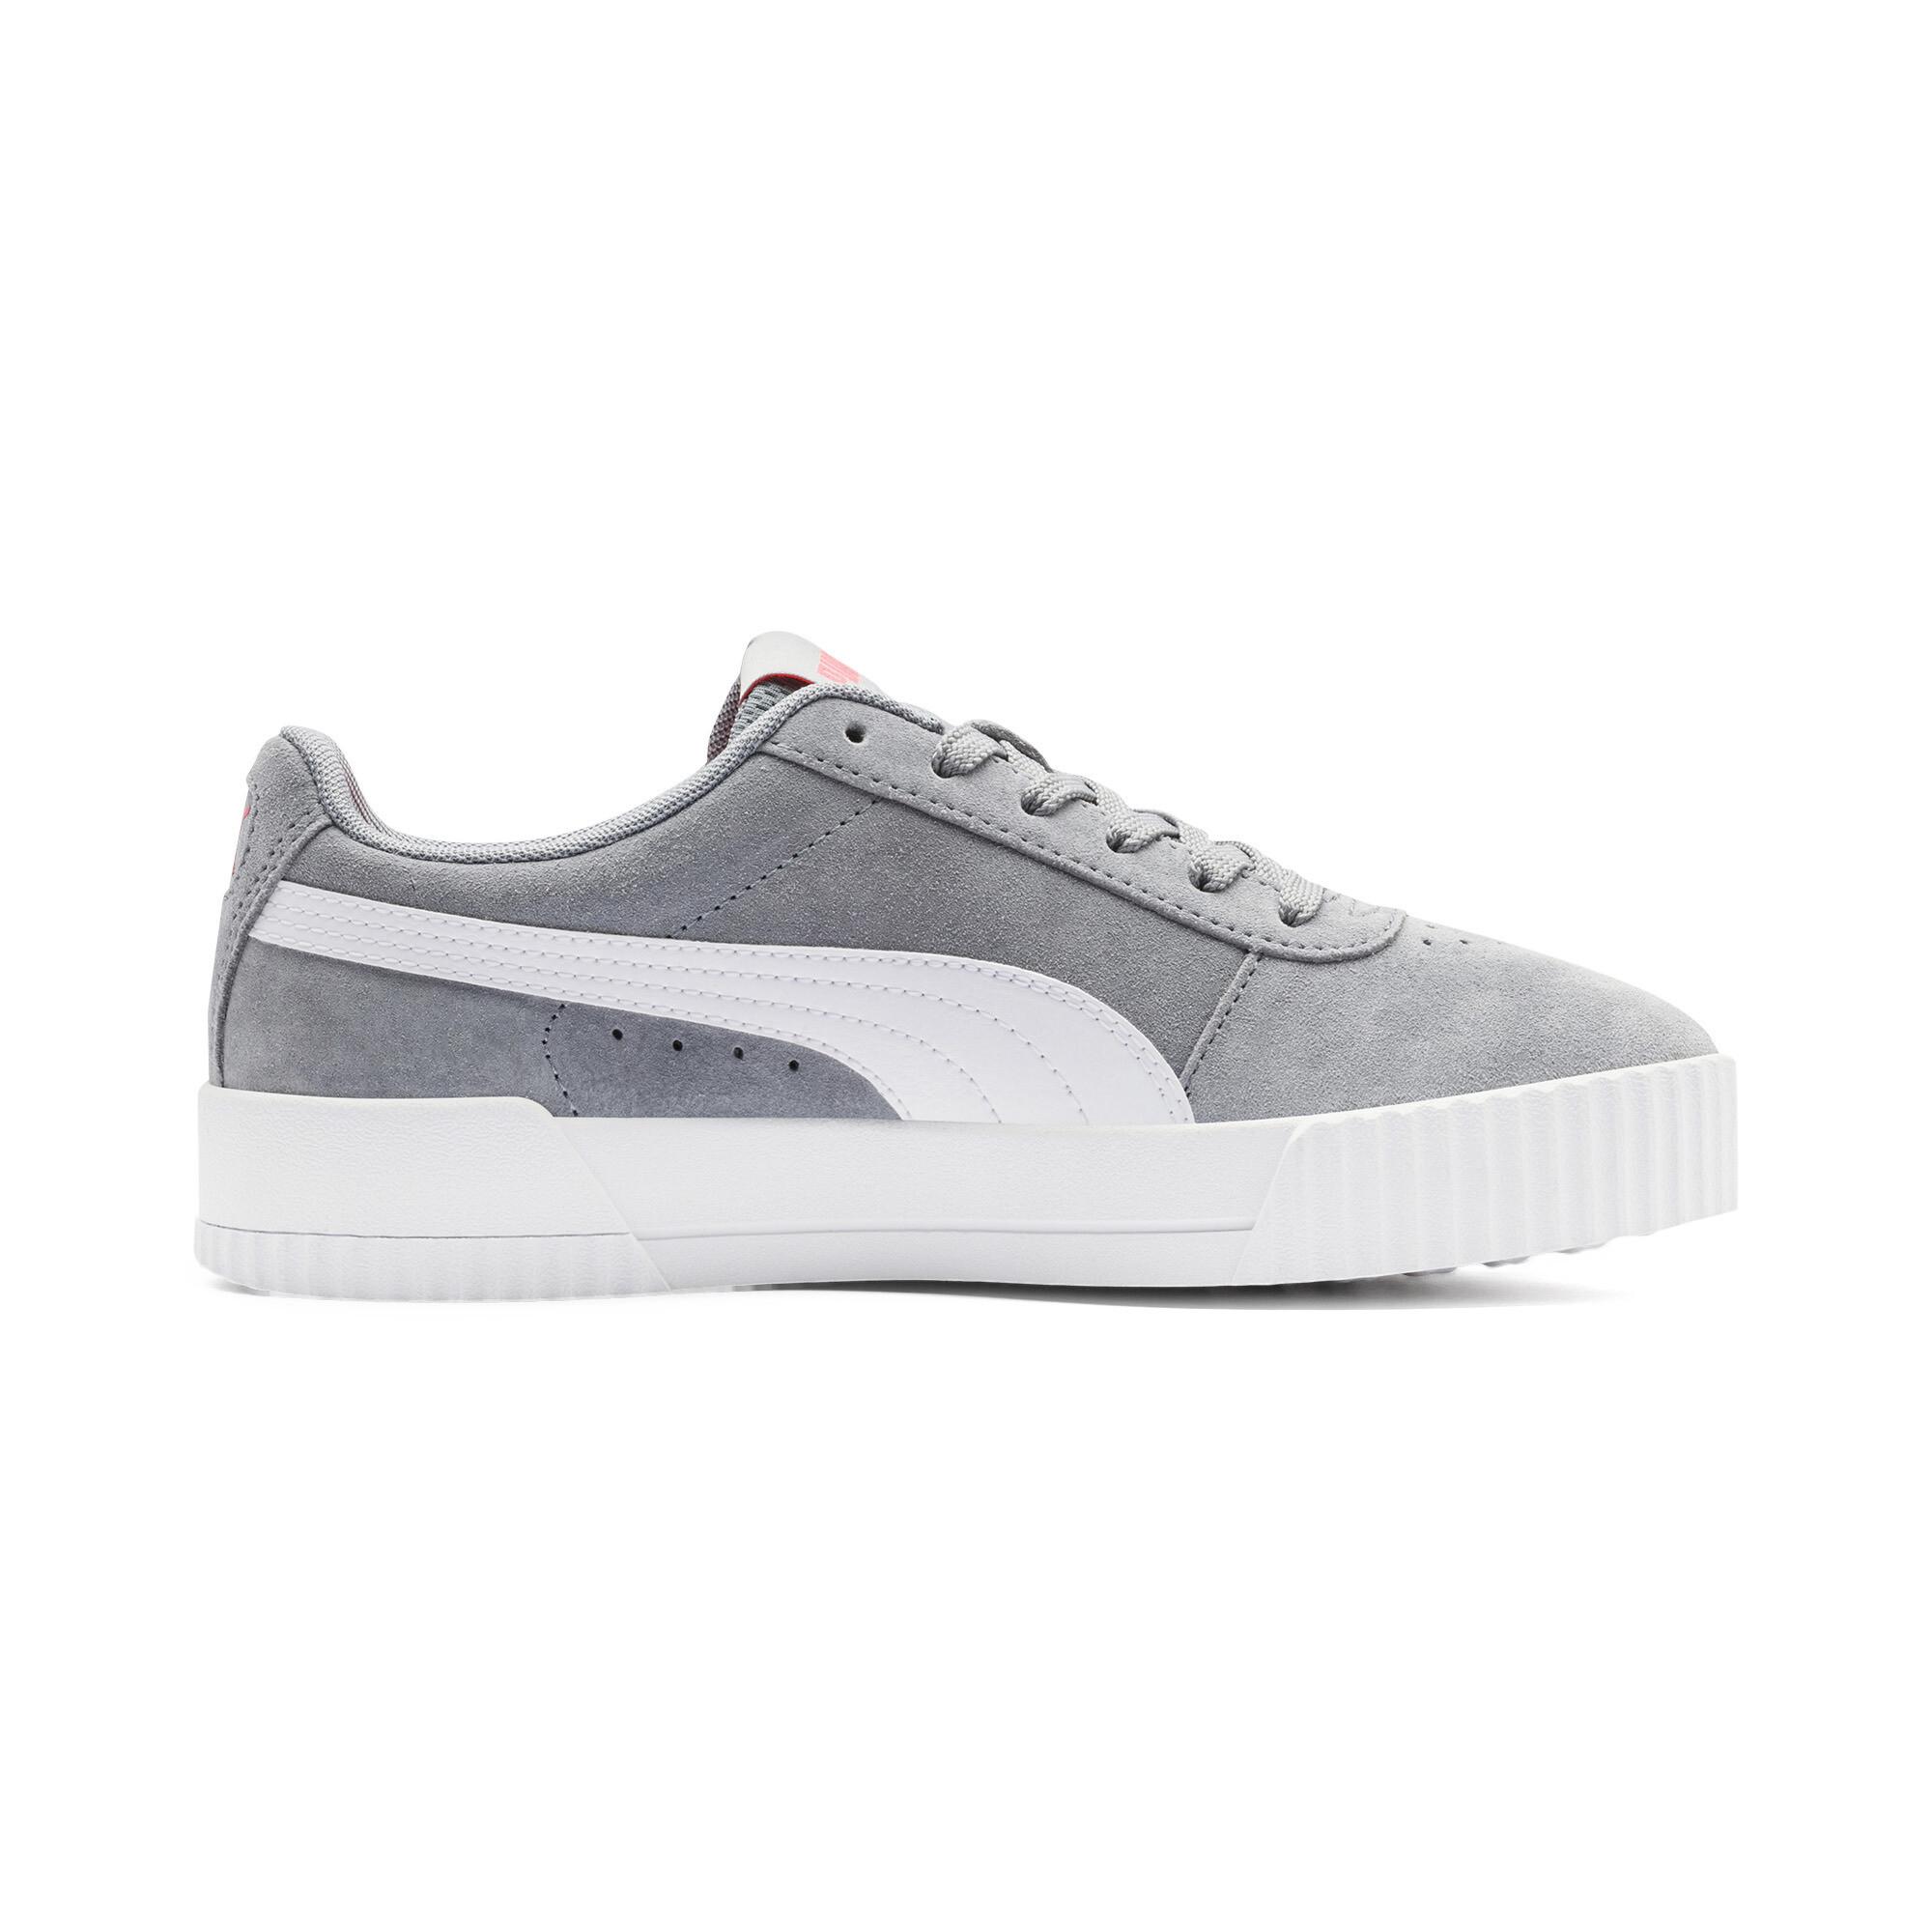 PUMA-Carina-Women-s-Sneakers-Women-Shoe-Basics thumbnail 7